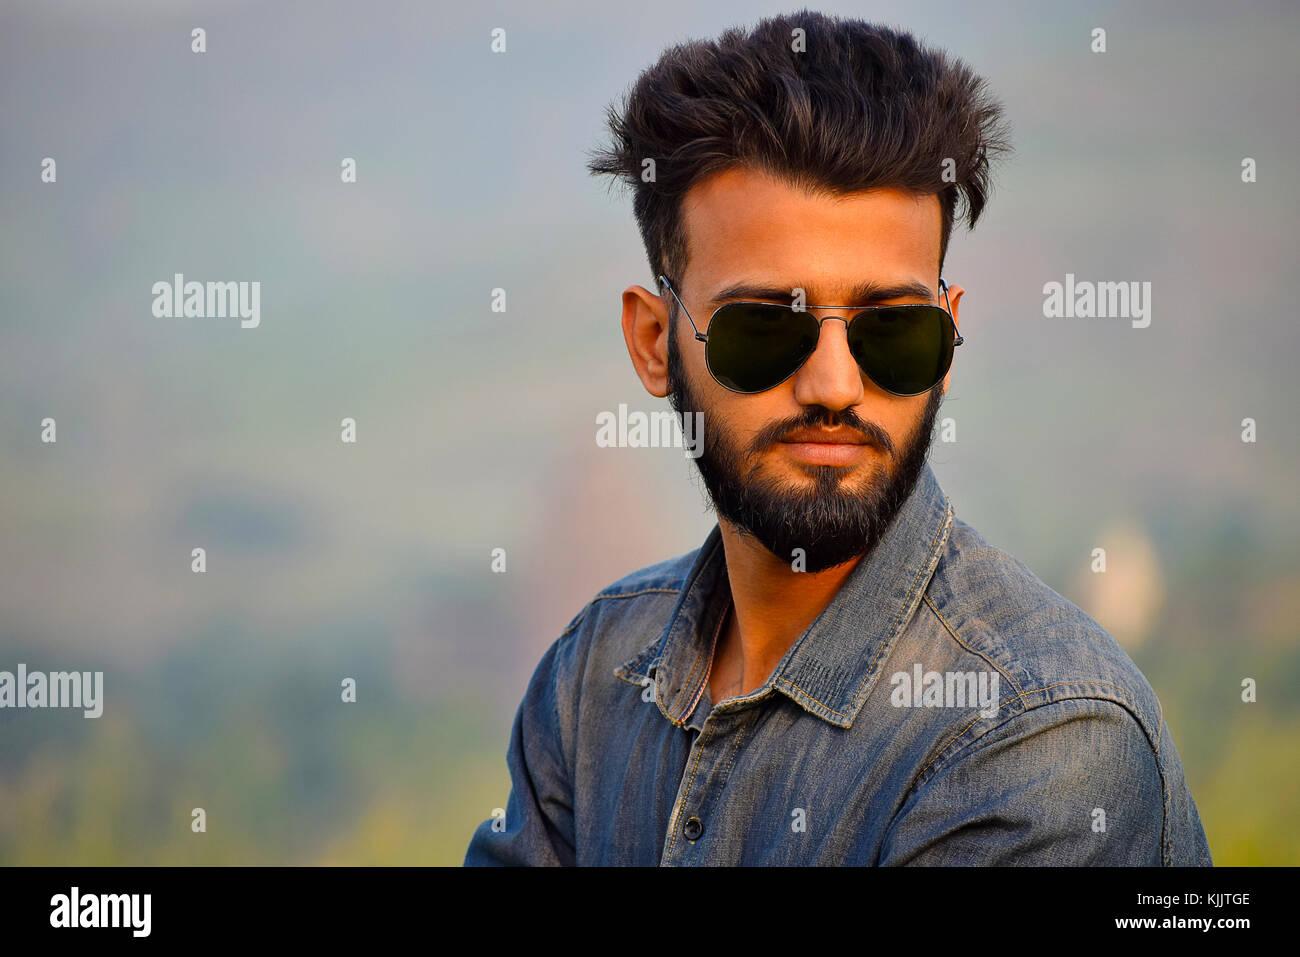 Indian Boy with sun glasses near mountain, Pune, Maharashtra. - Stock Image